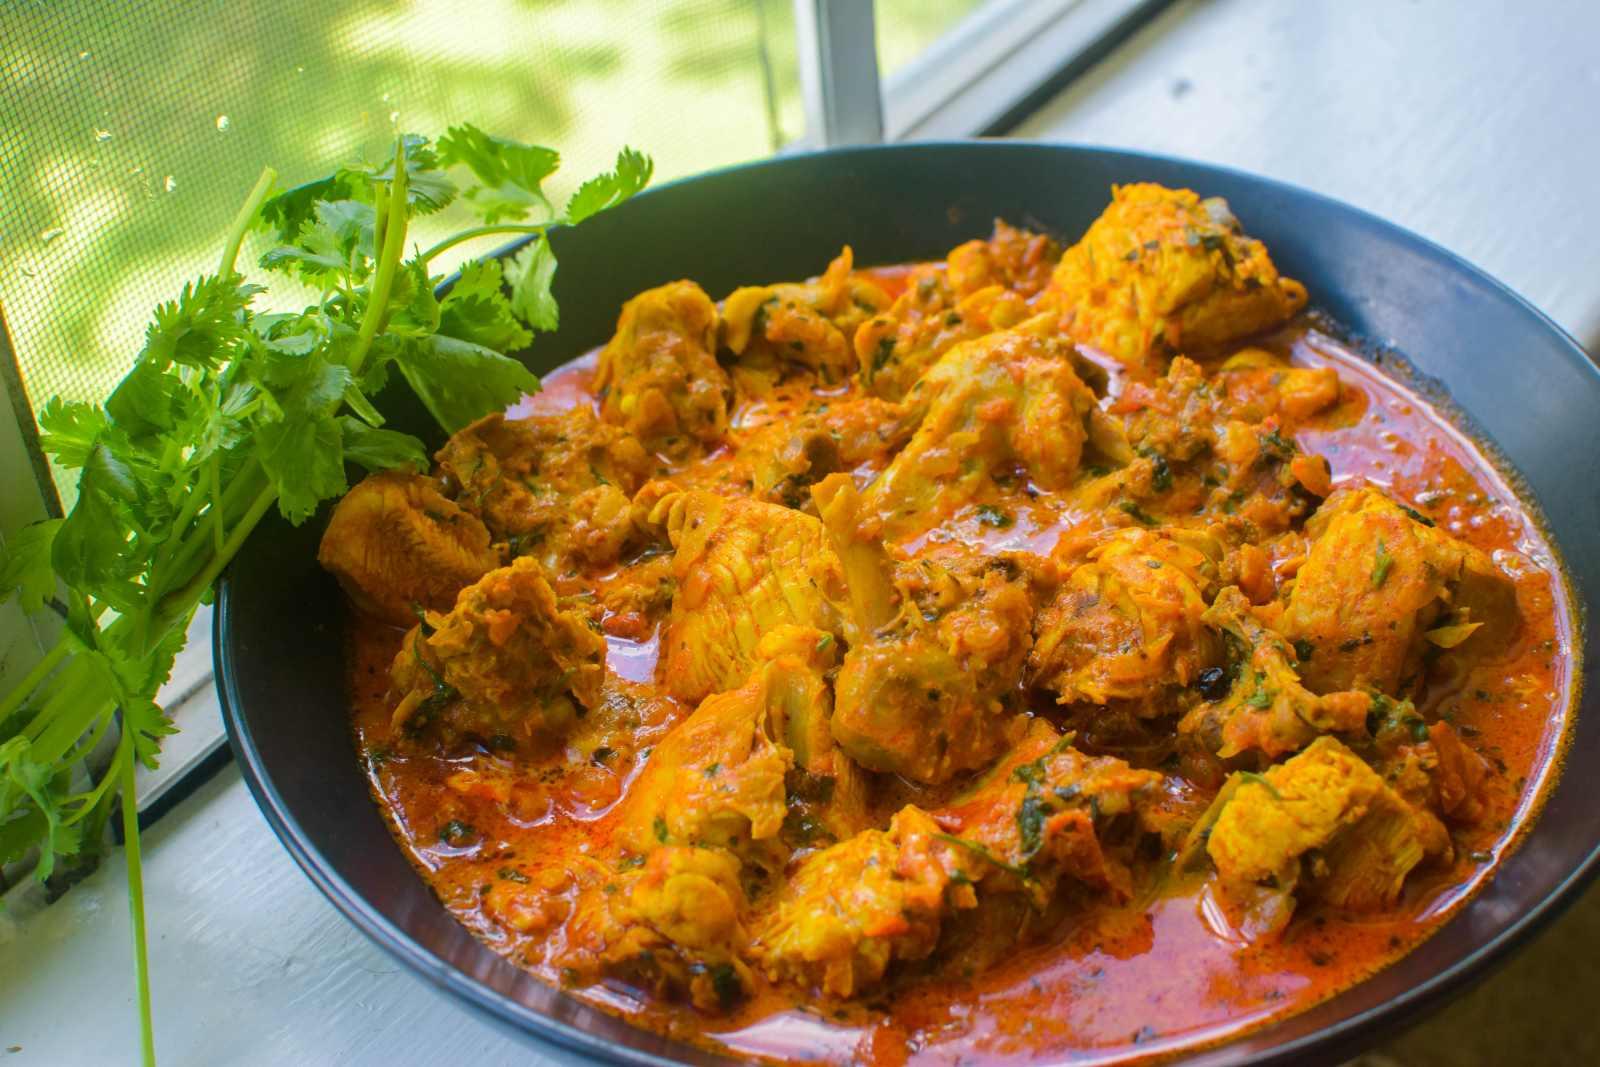 Tandoori Chicken Curry Recipe By Archana S Kitchen Watermelon Wallpaper Rainbow Find Free HD for Desktop [freshlhys.tk]